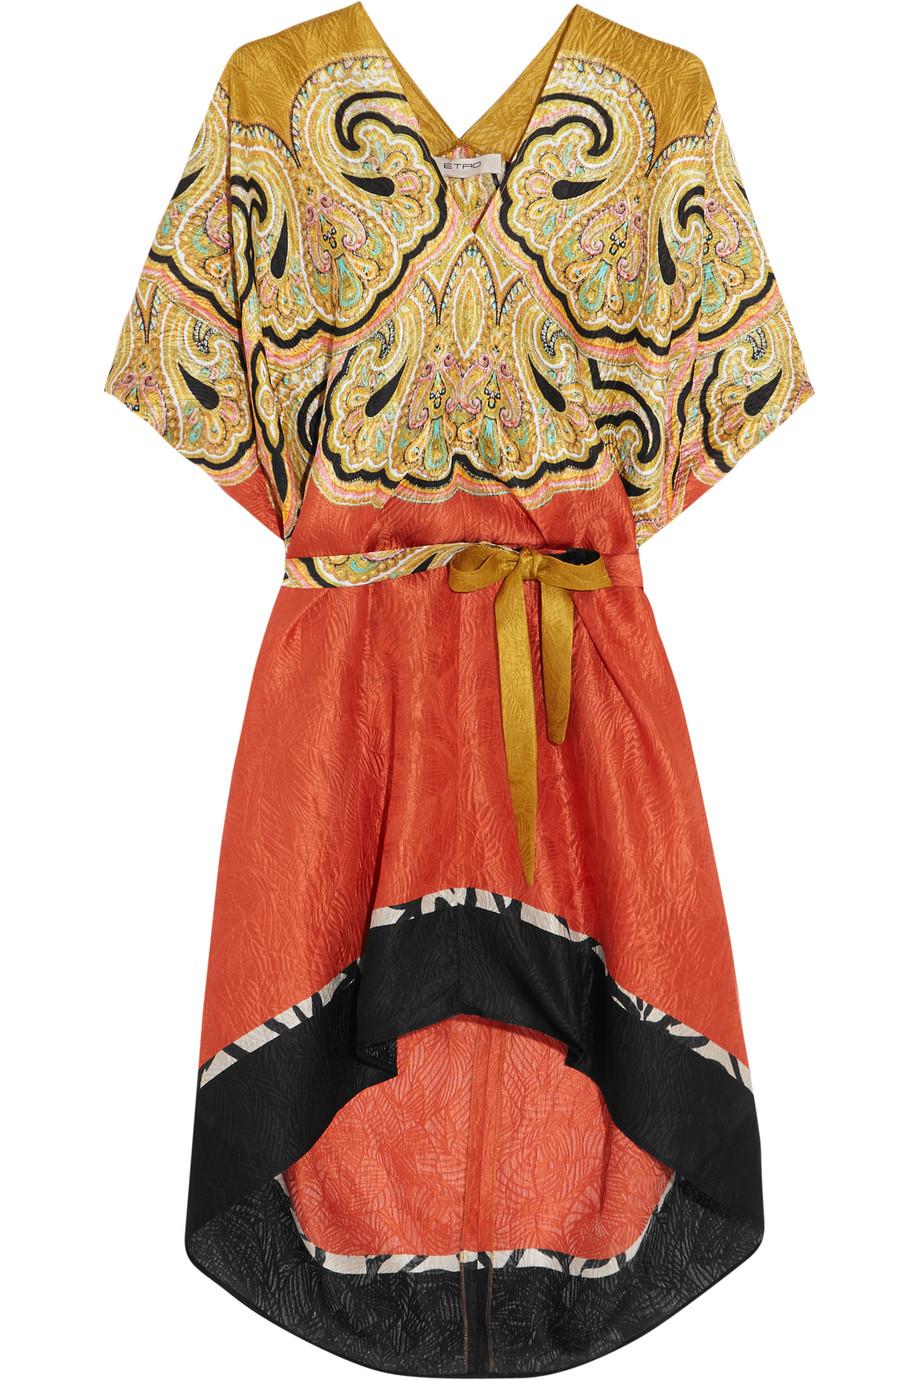 Etro Printed Silk-Jacquard Mini Dress, Orange, Women's - Printed, Size: 42